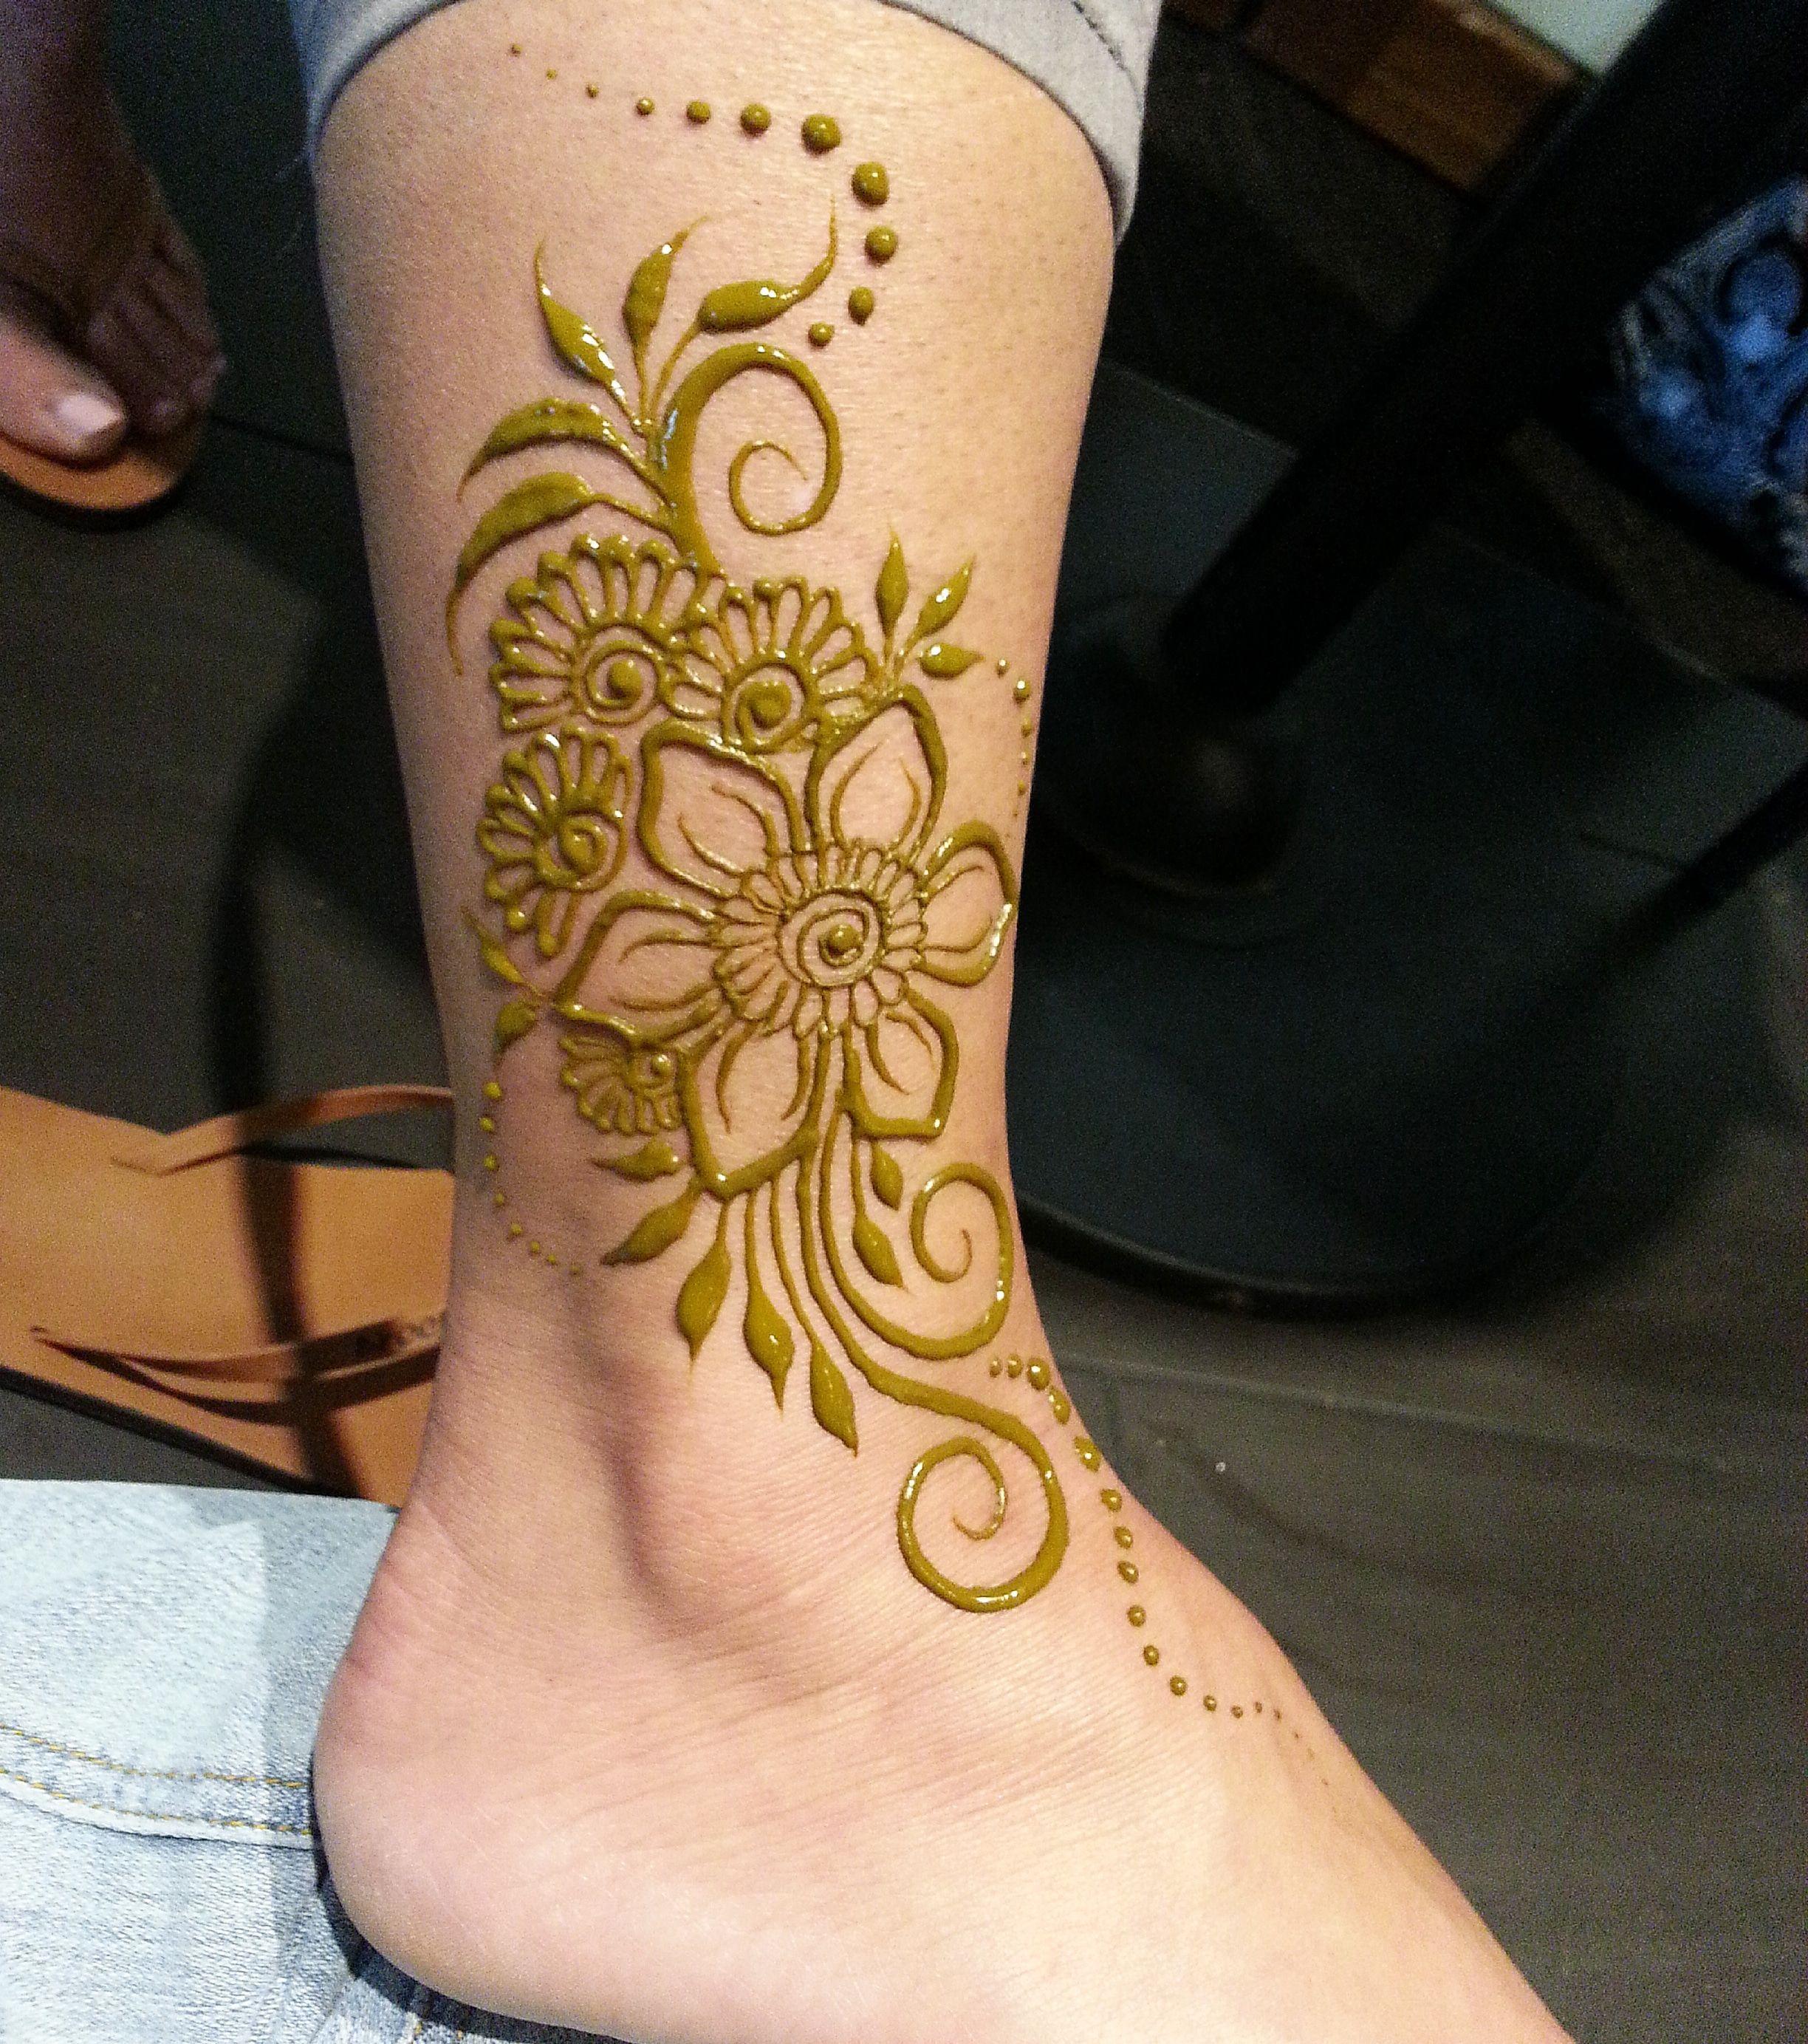 Natural Henna Anklet For Spring Henna Designs Feet Legs Mehndi